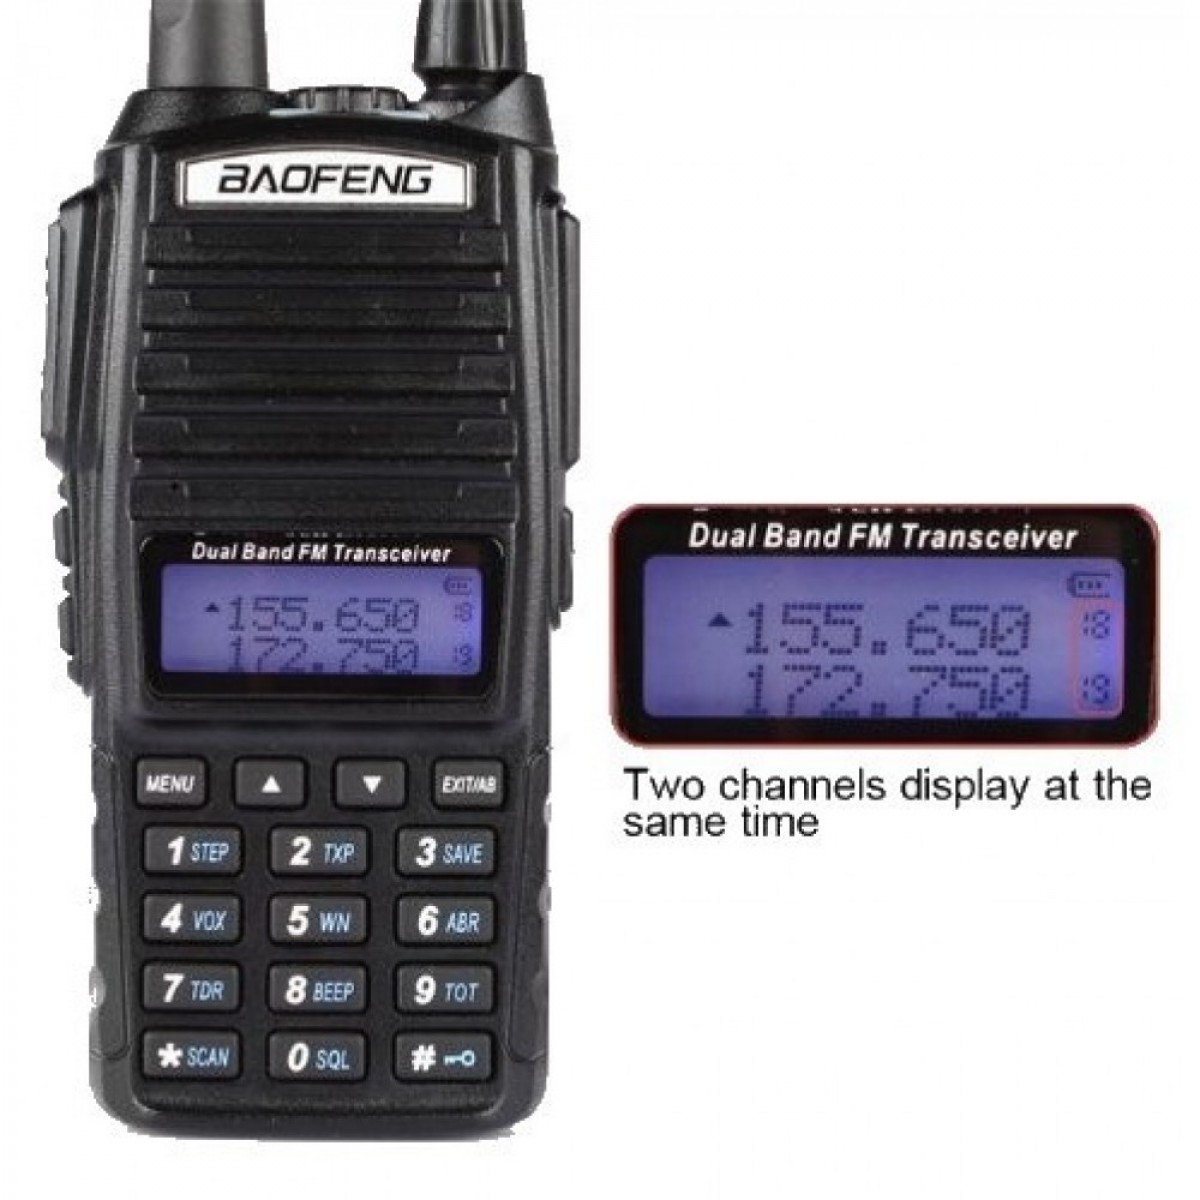 BAOFENG ΑΣΥΡΜΑΤΟΣ DUAL BAND ΠΟΜΠΟΔΕΚΤΗΣ VHF/UHF UV-82